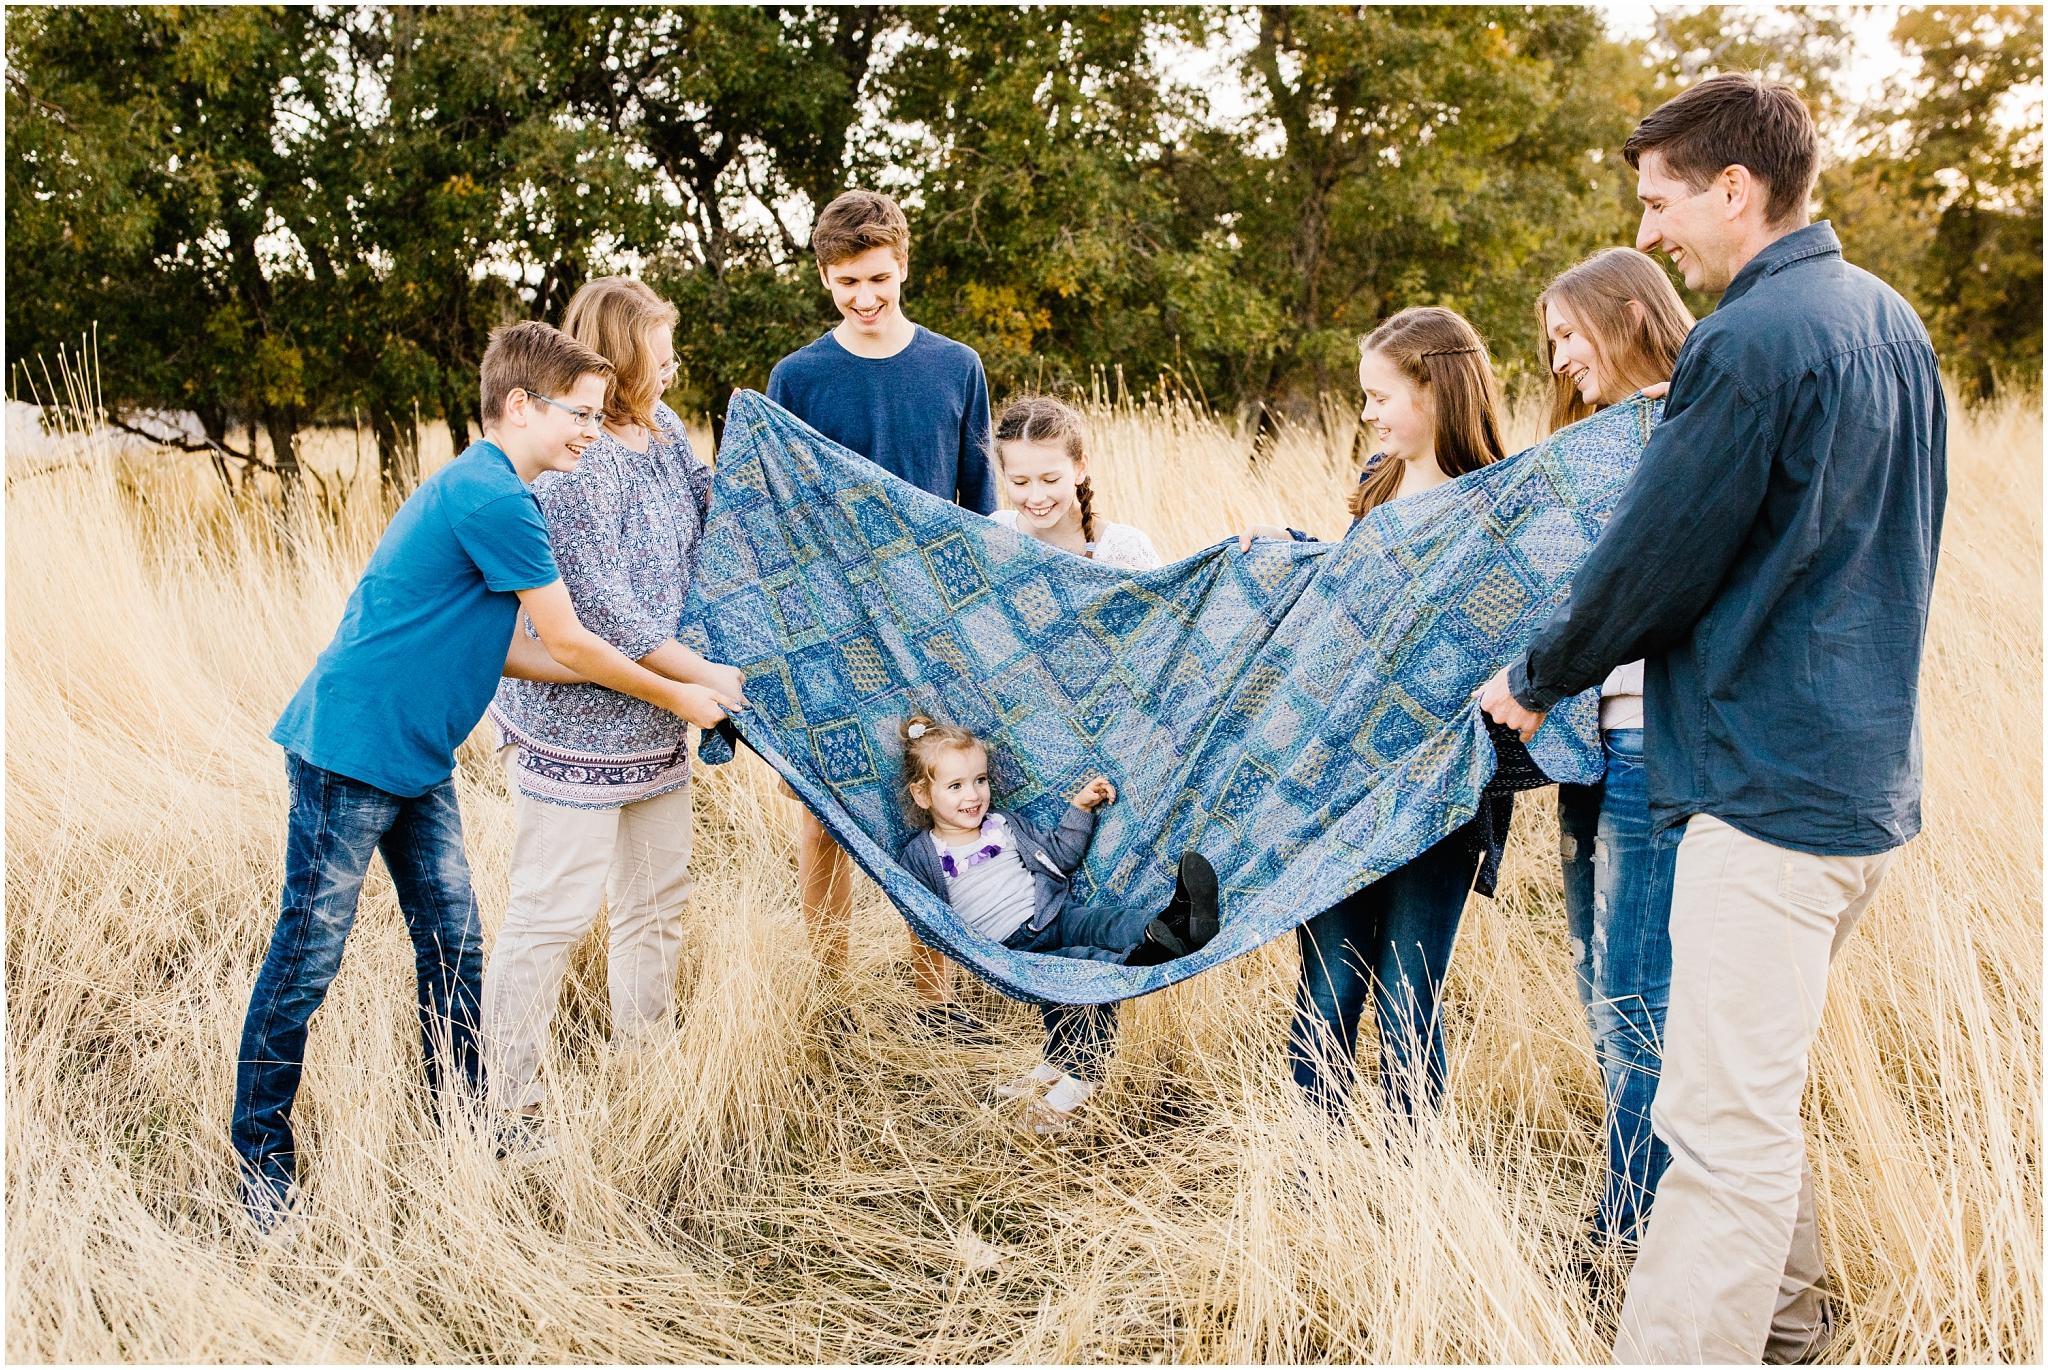 Jaursch-177_Lizzie-B-Imagery-Utah-Family-Photographer-Salt-Lake-City-Park-City-Herriman-Utah-County.jpg